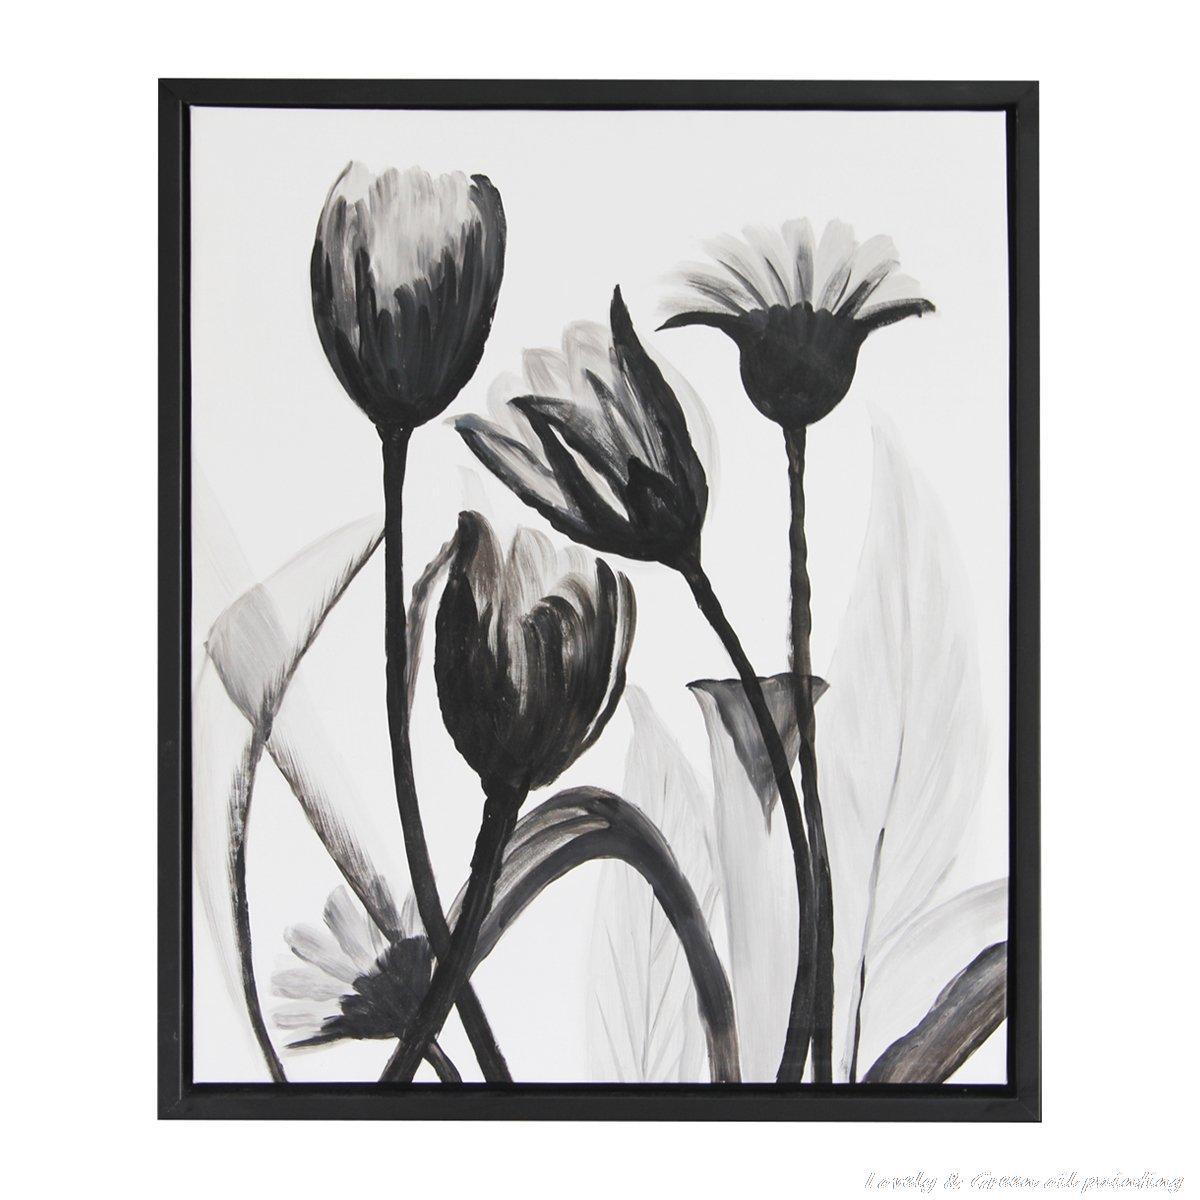 Black White Flower Oil Painting On Canvas Modern Tulipa Gesneriana